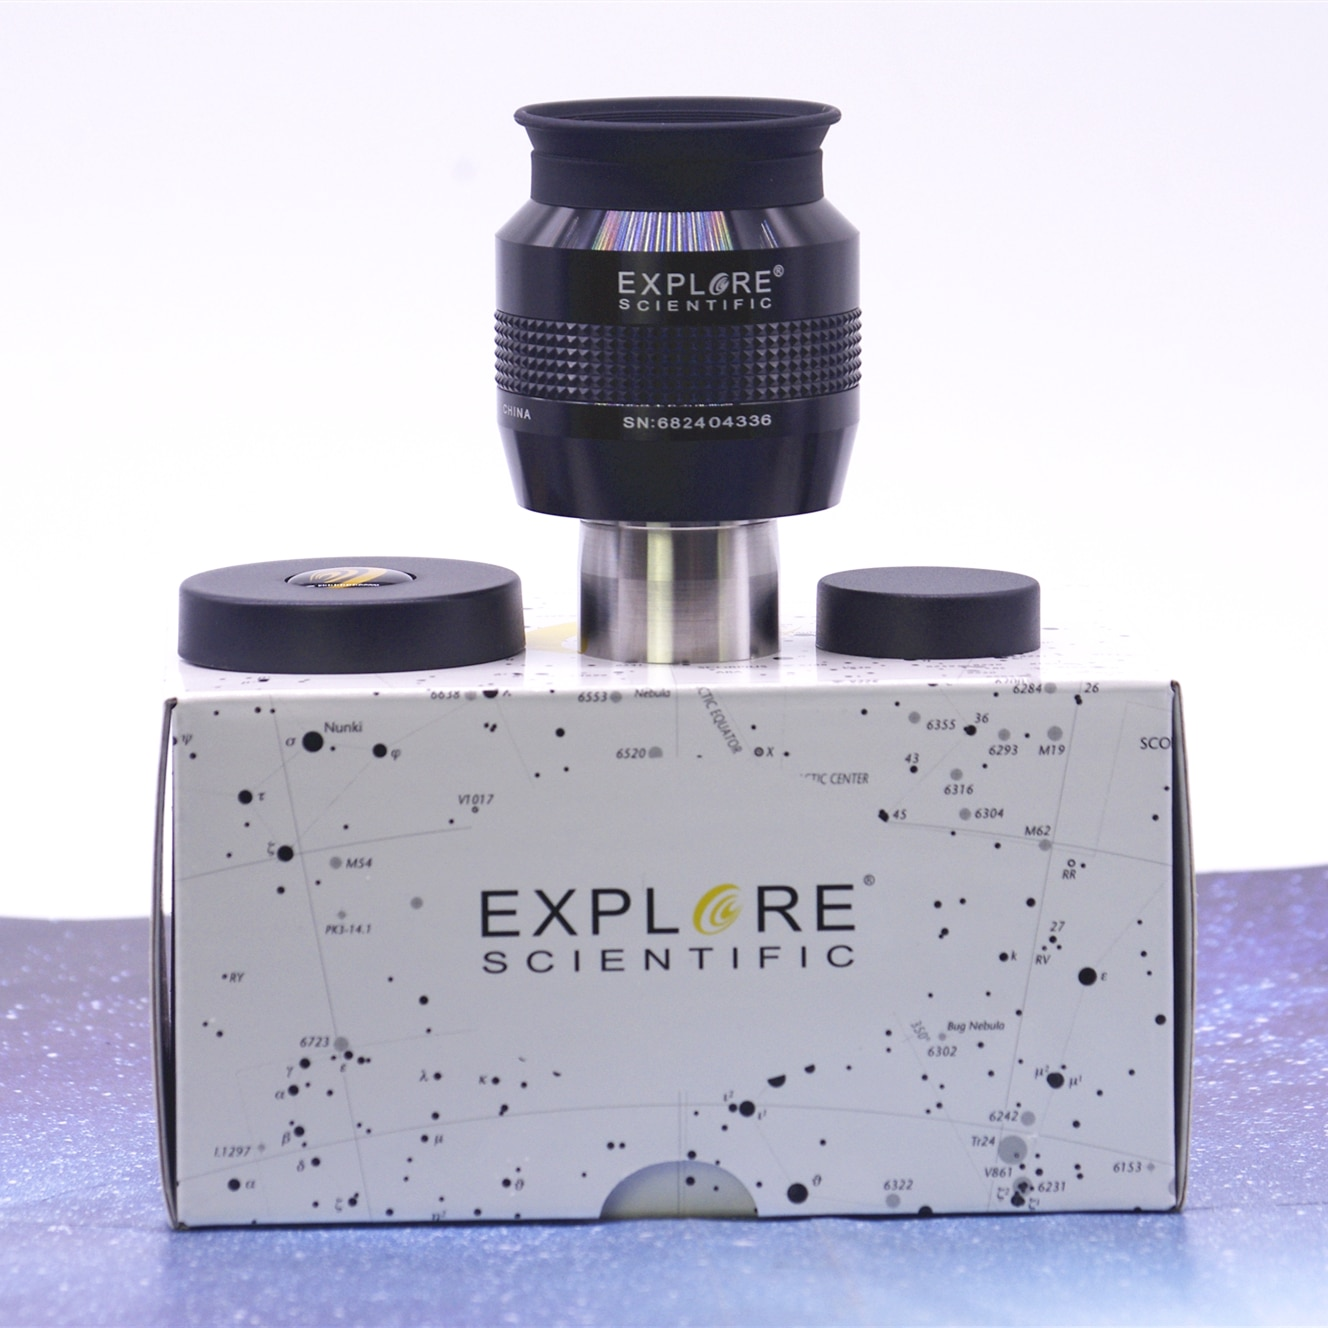 Explore Scientific EMD Coatings Eyepiece 68 ° 82 degree Waterproof 1.25inch 4.7mm 6.7mm 8.8mm 11mm 14mm 2inch 18mm 24mm 30mm